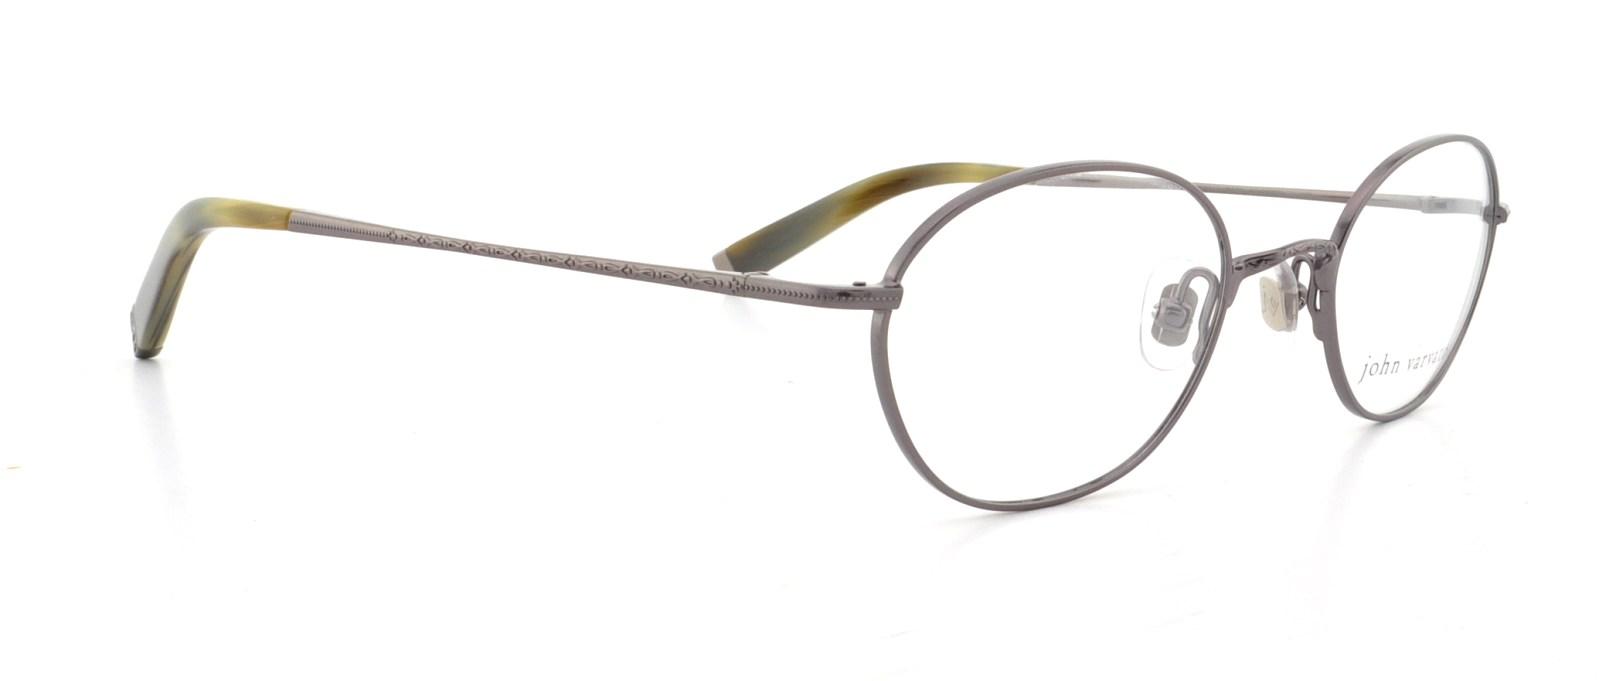 John Varvatos Eyeglasses V111 Gunmetal 46mm 751286079746